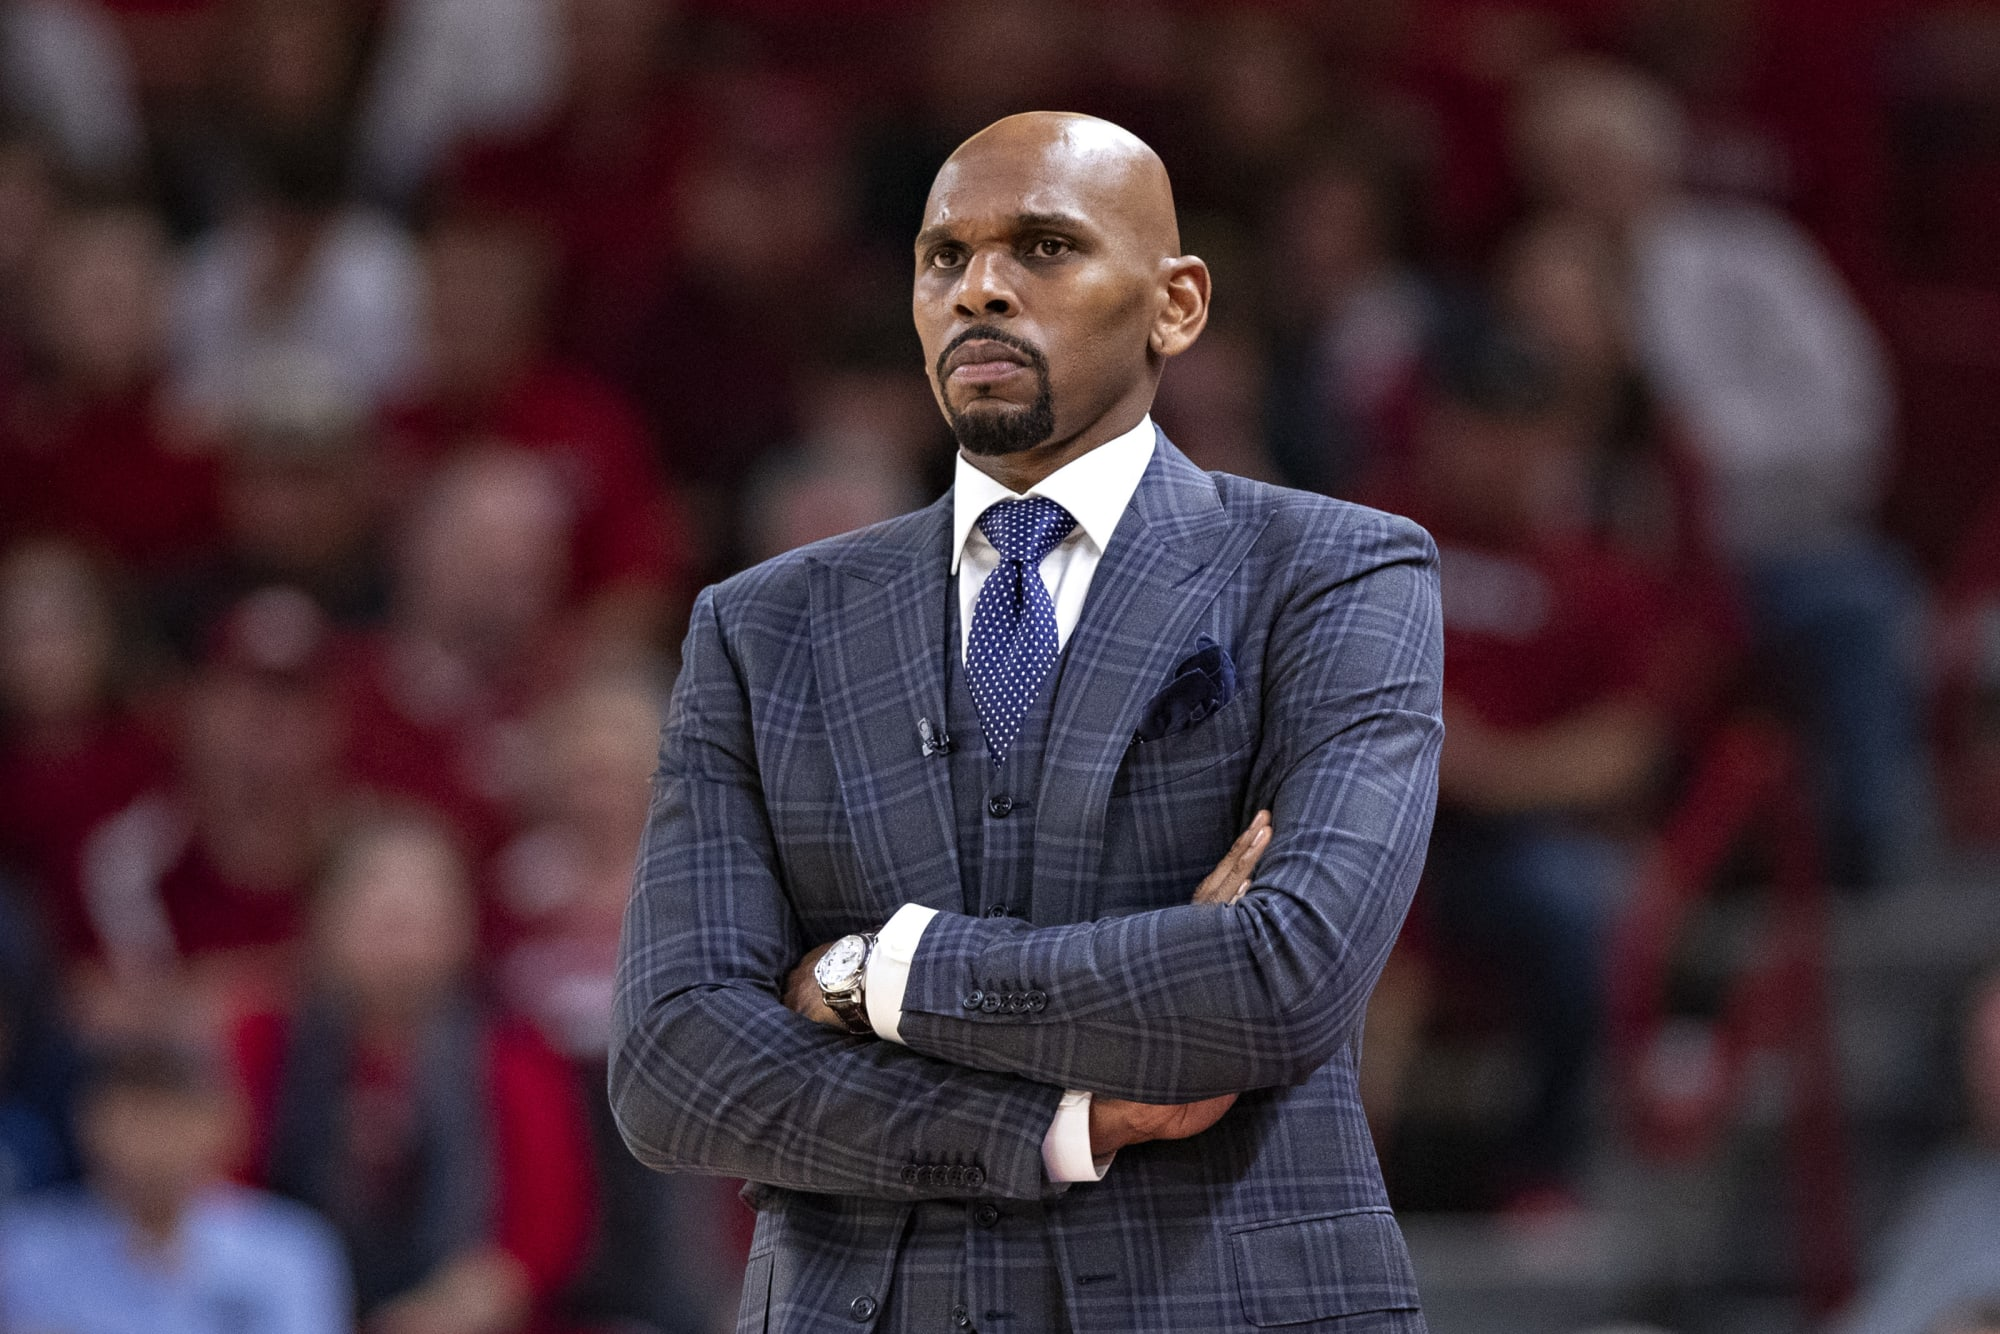 Toronto Raptors: Former Raptors 905 coach Jerry Stackhouse deserves North Carolina job